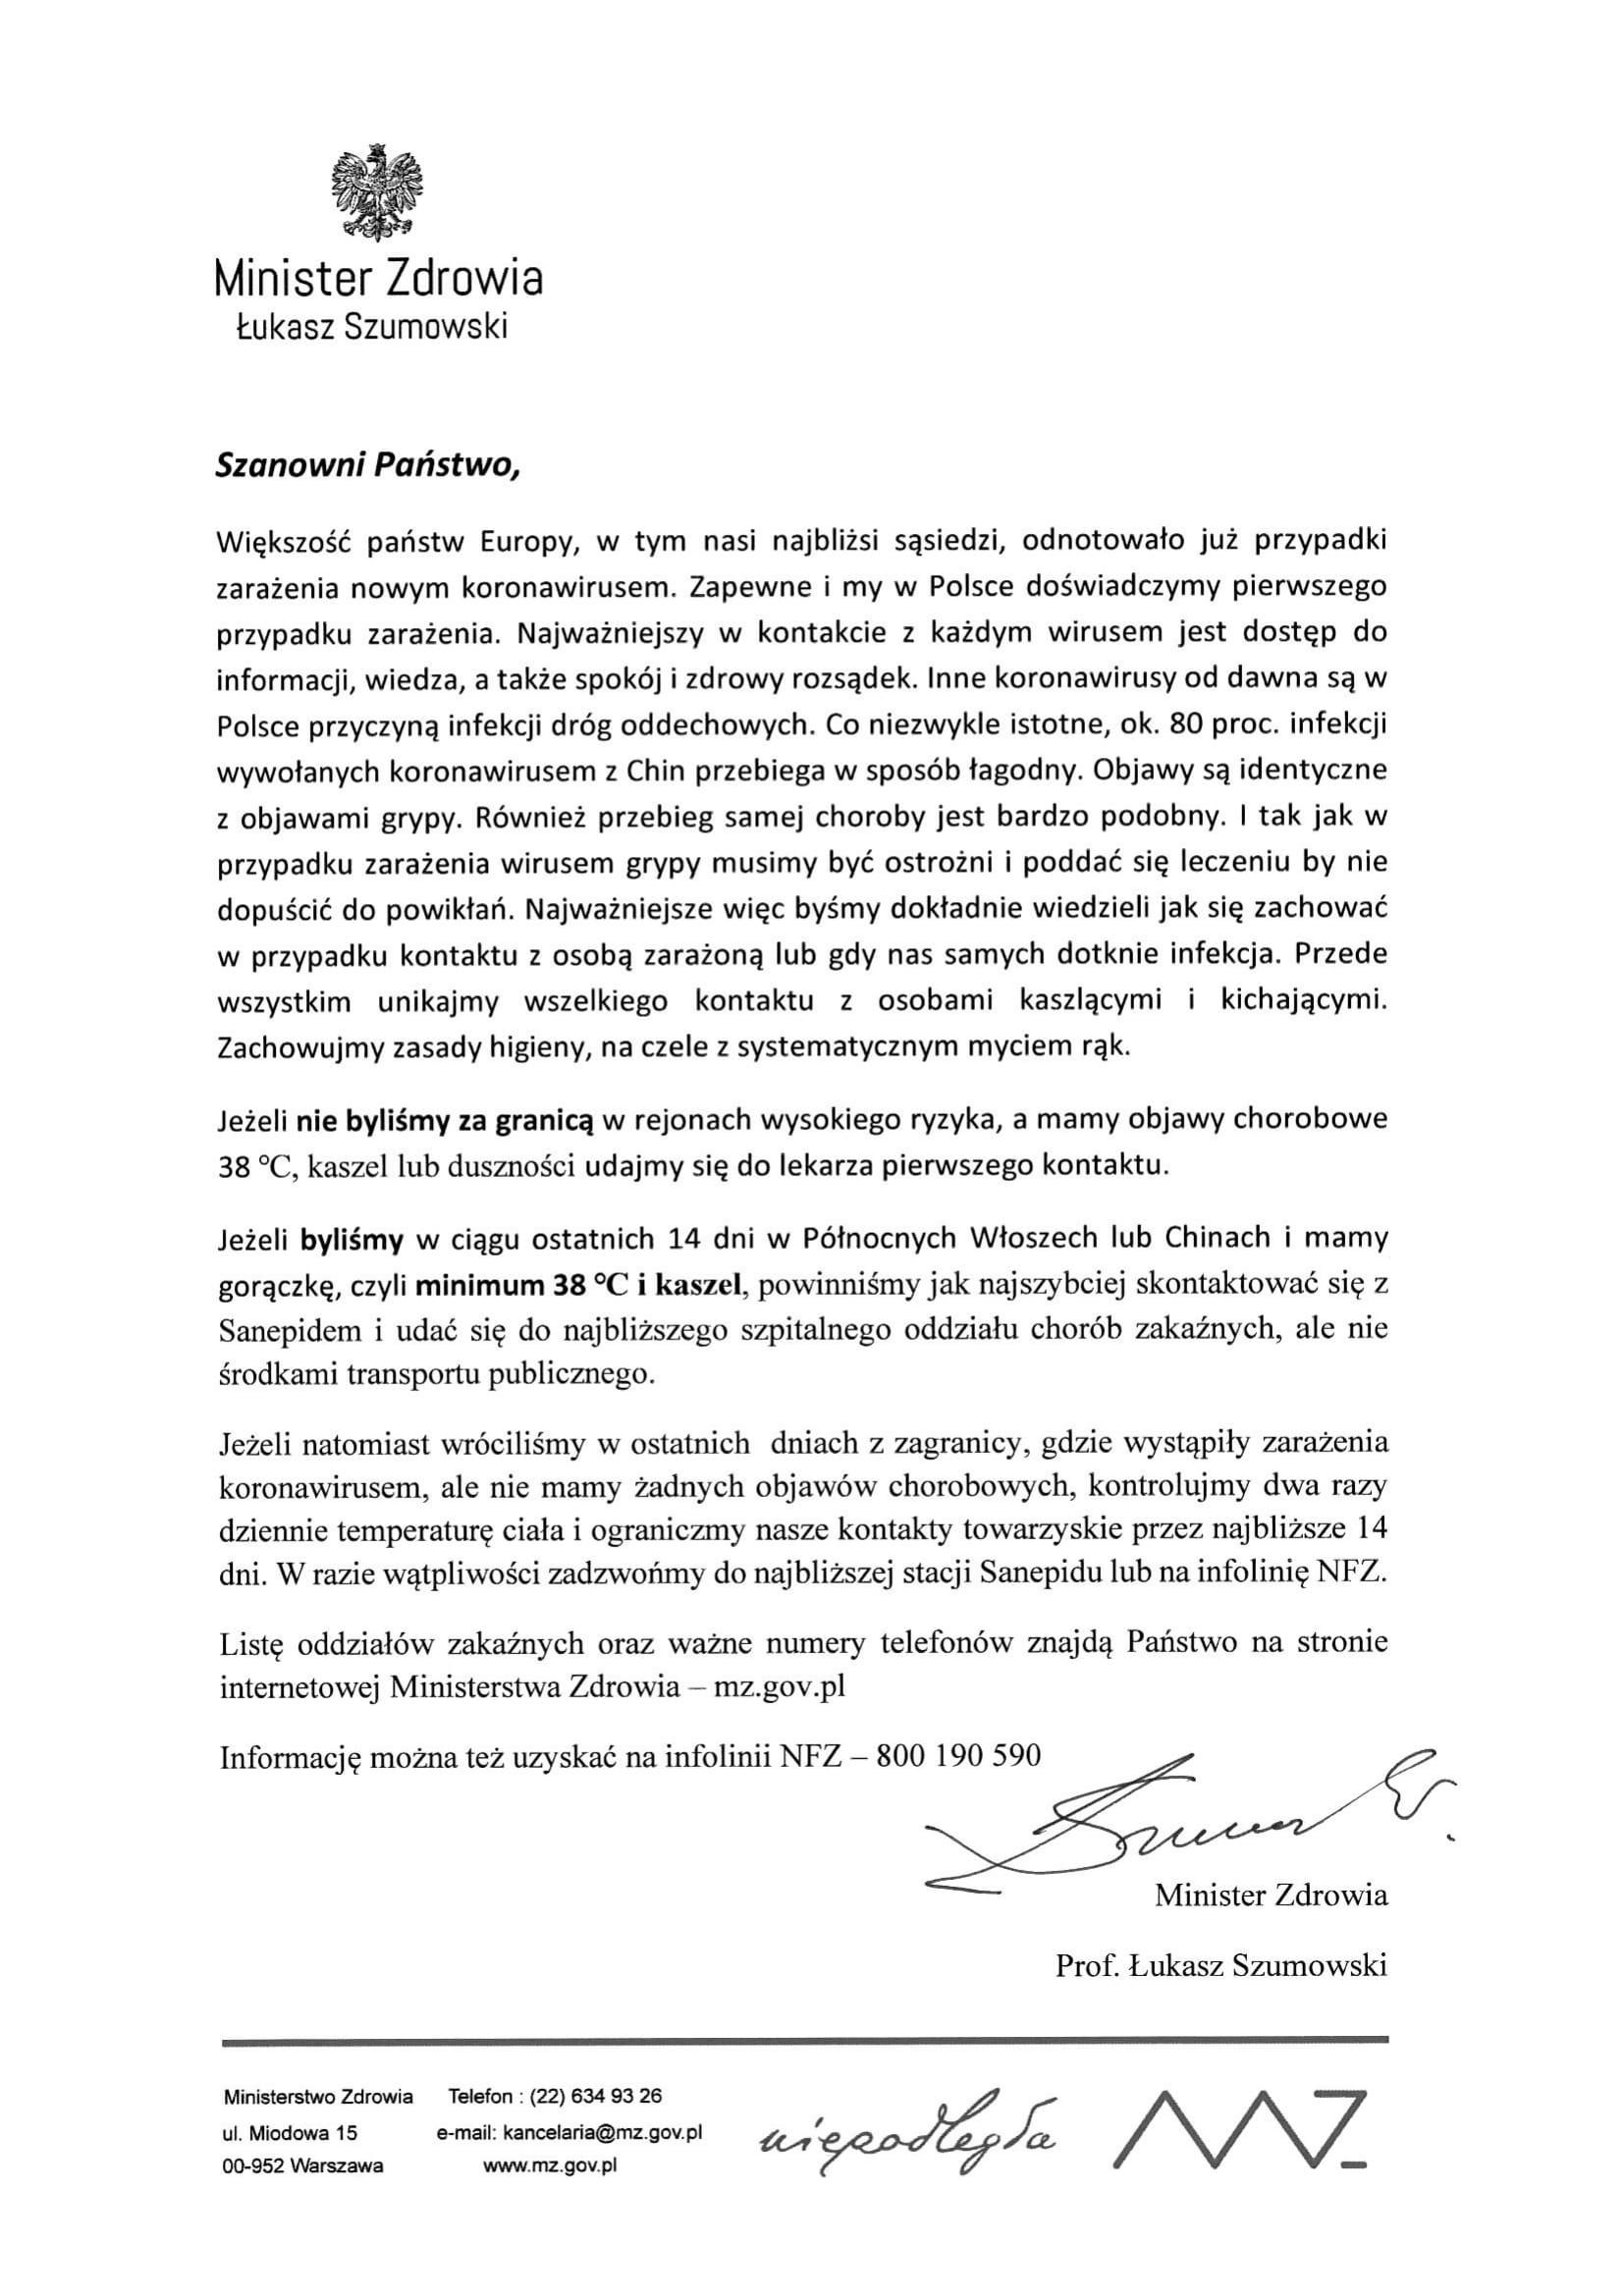 Pismo Ministra Zdrowia.doc-1